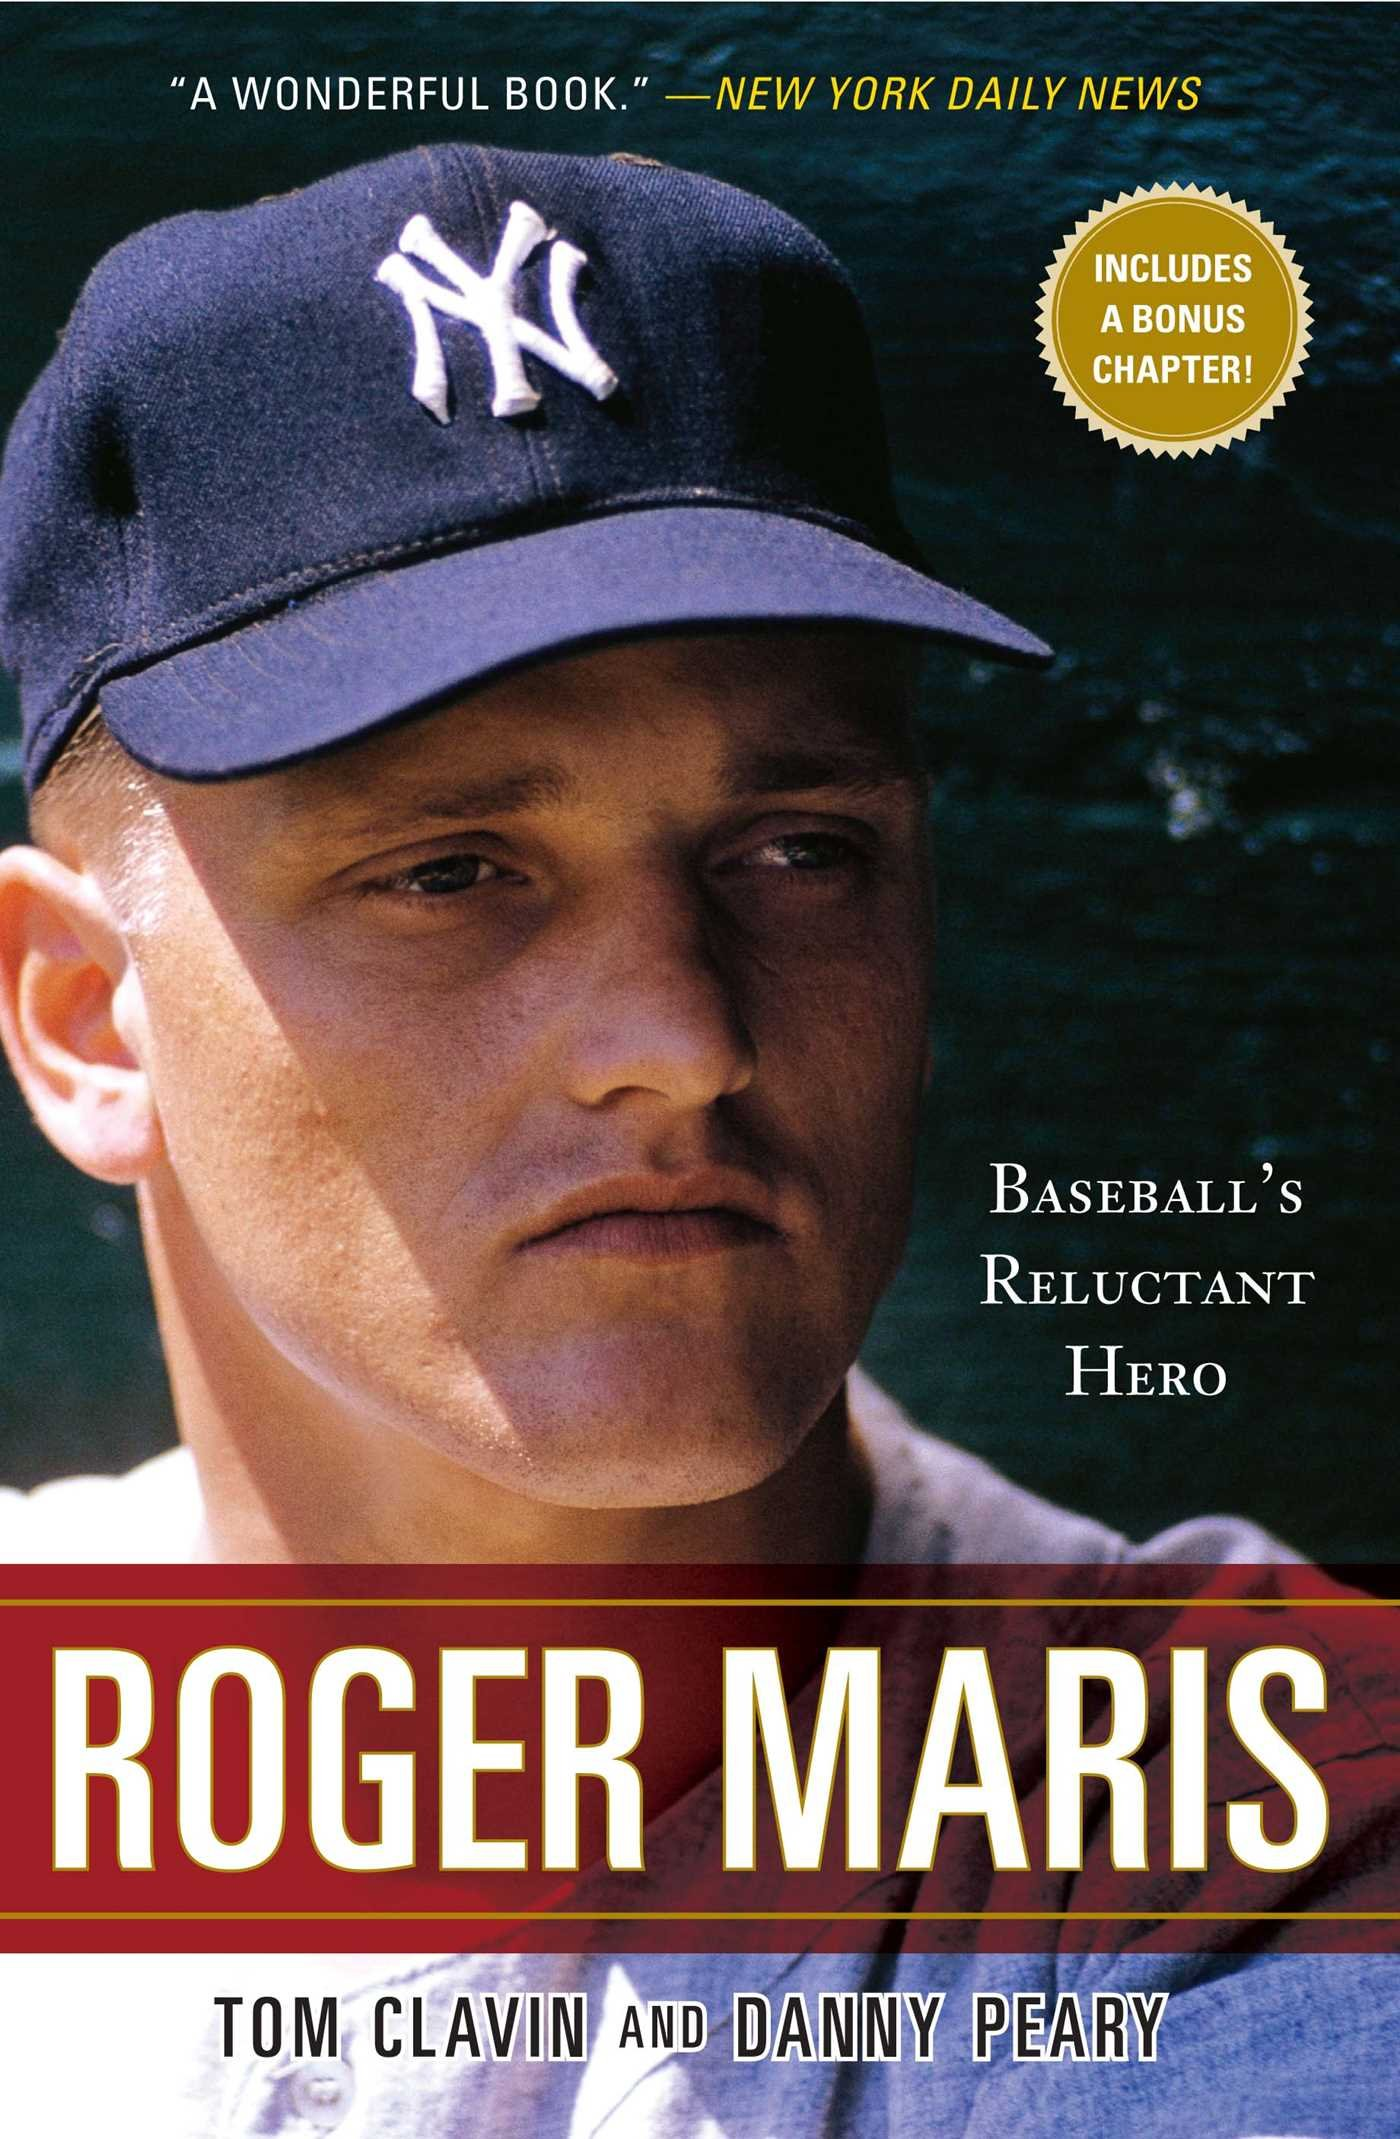 roger maris biography